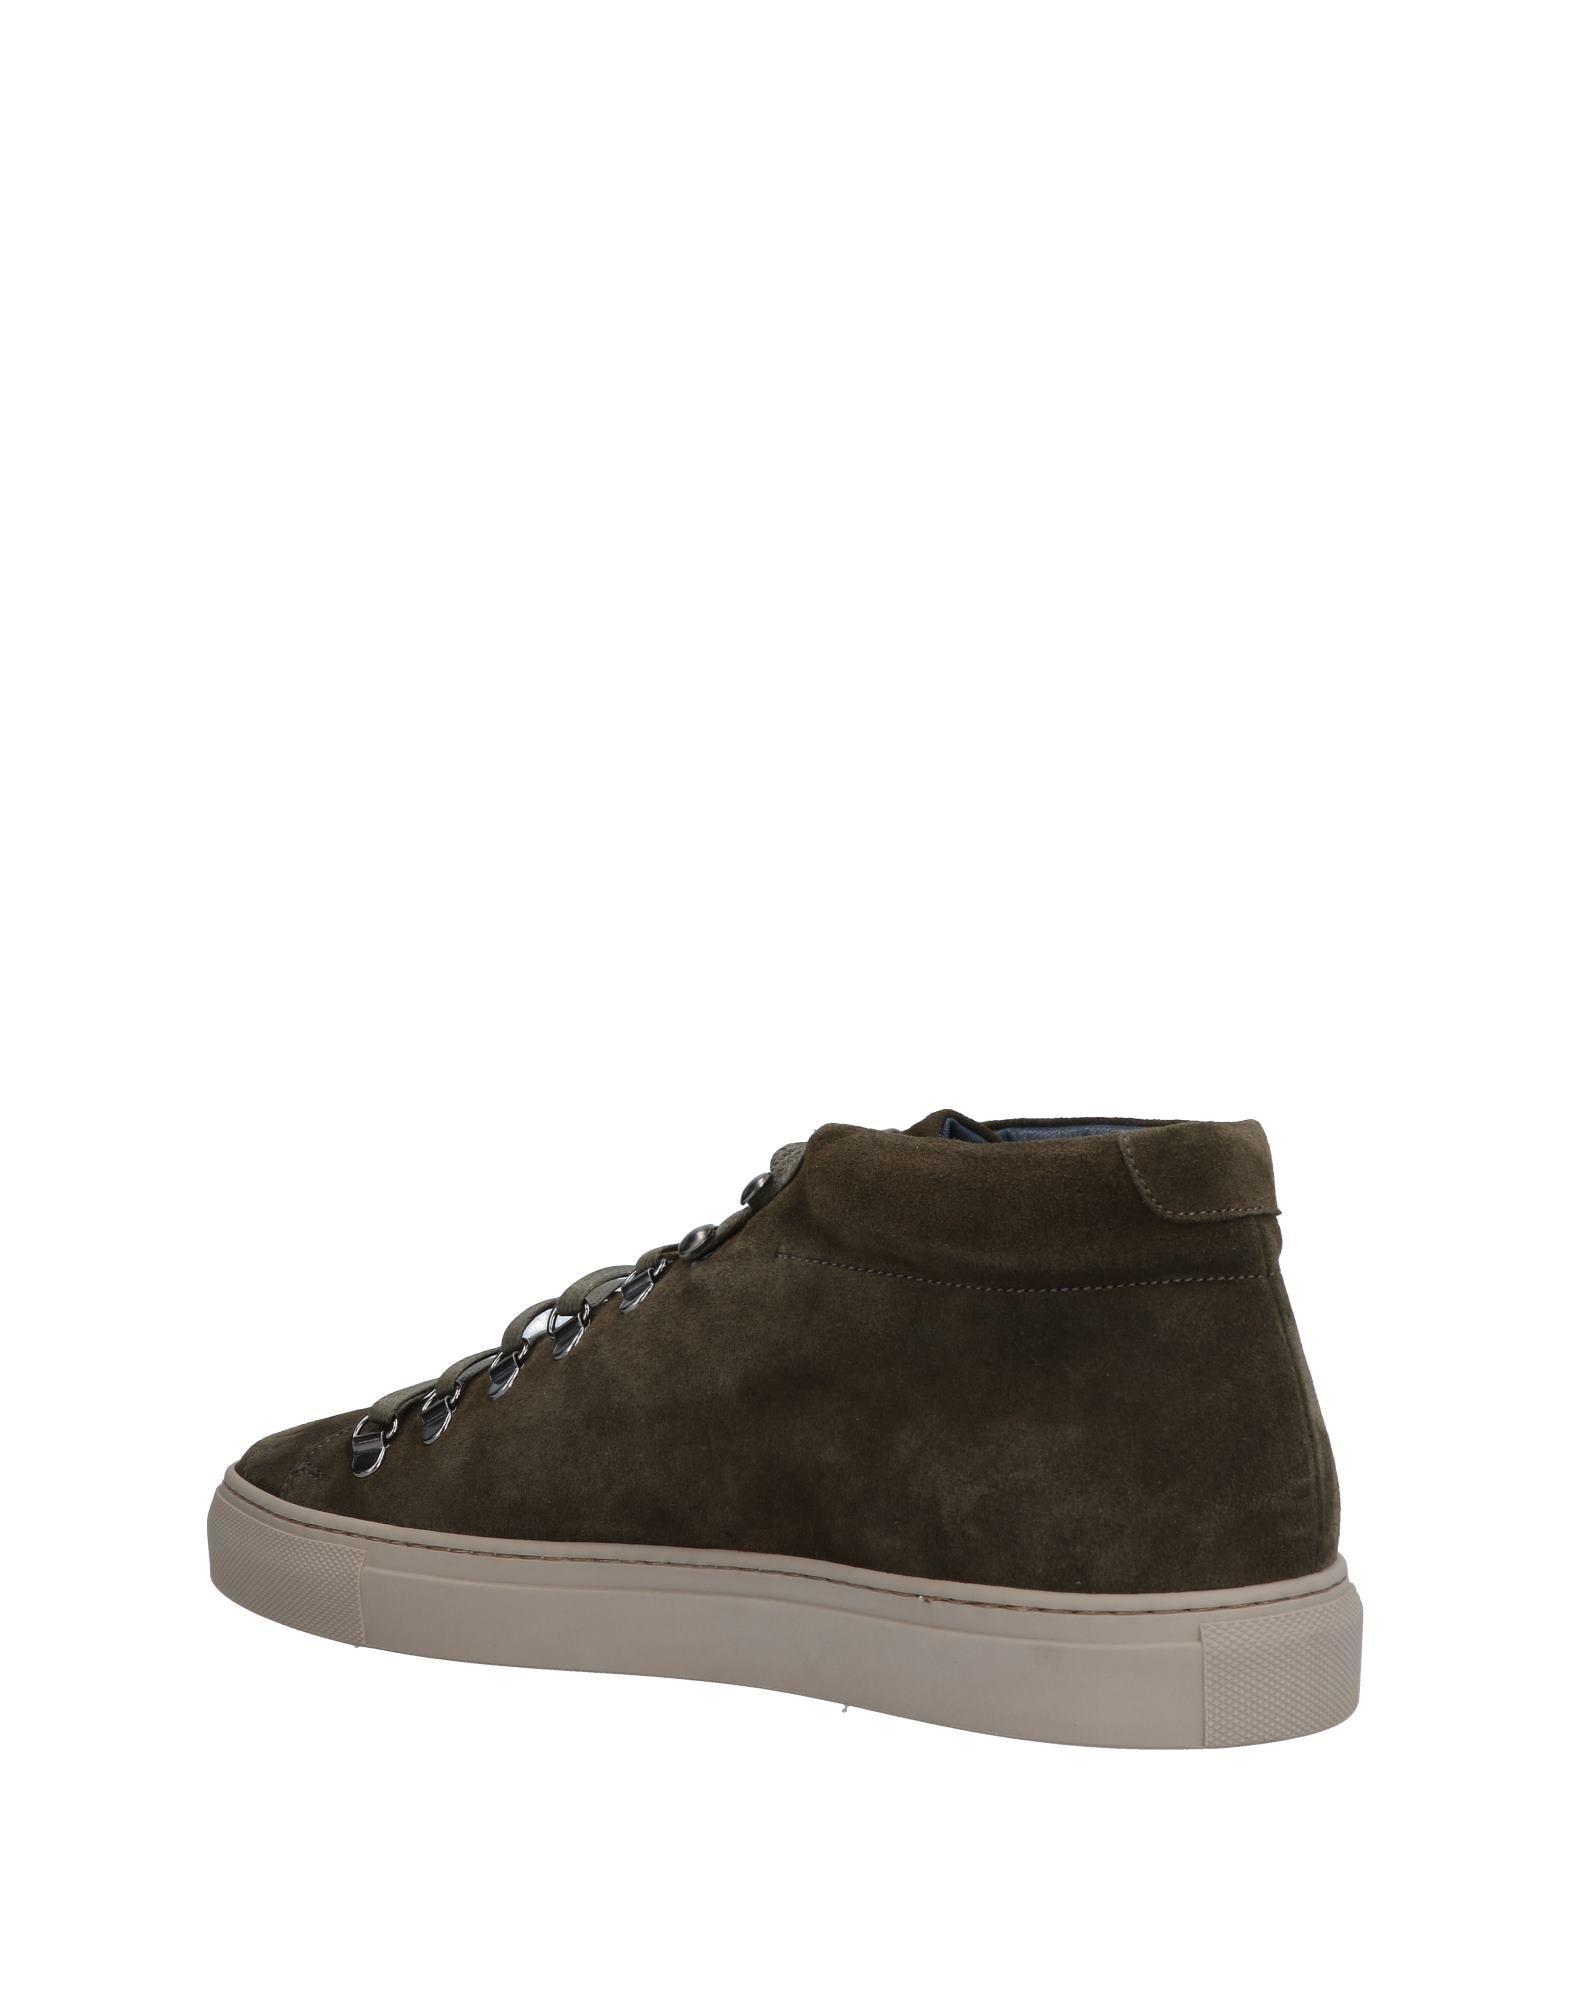 Rabatt echte Sneakers Schuhe Andrea Zori Sneakers echte Herren  11487903MA 200a97